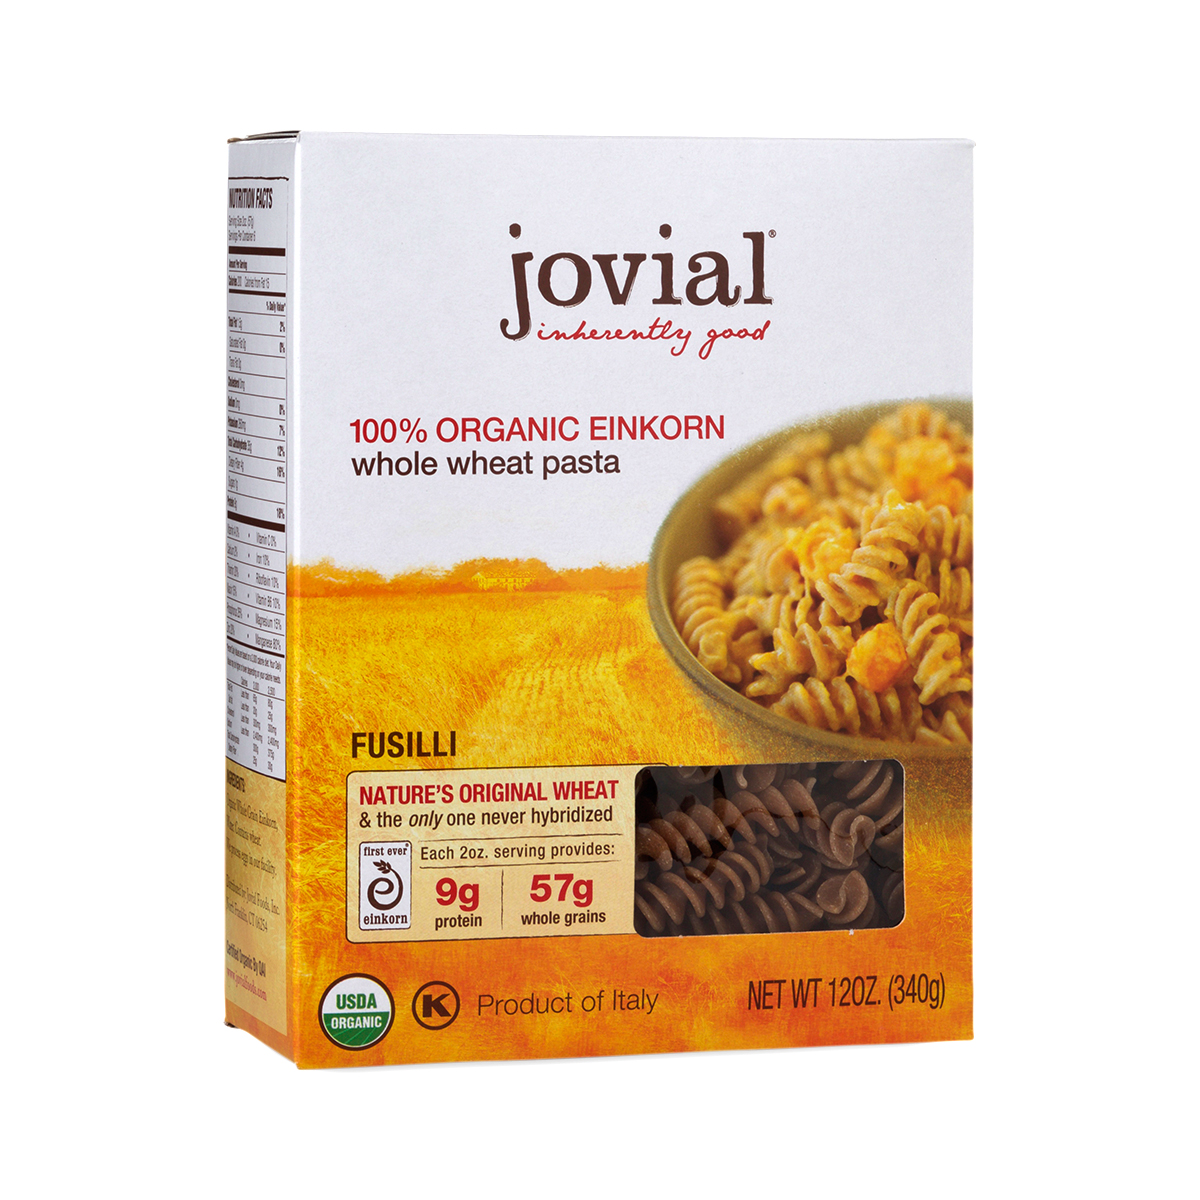 RCA Organic Einkorn Fusilli Pasta